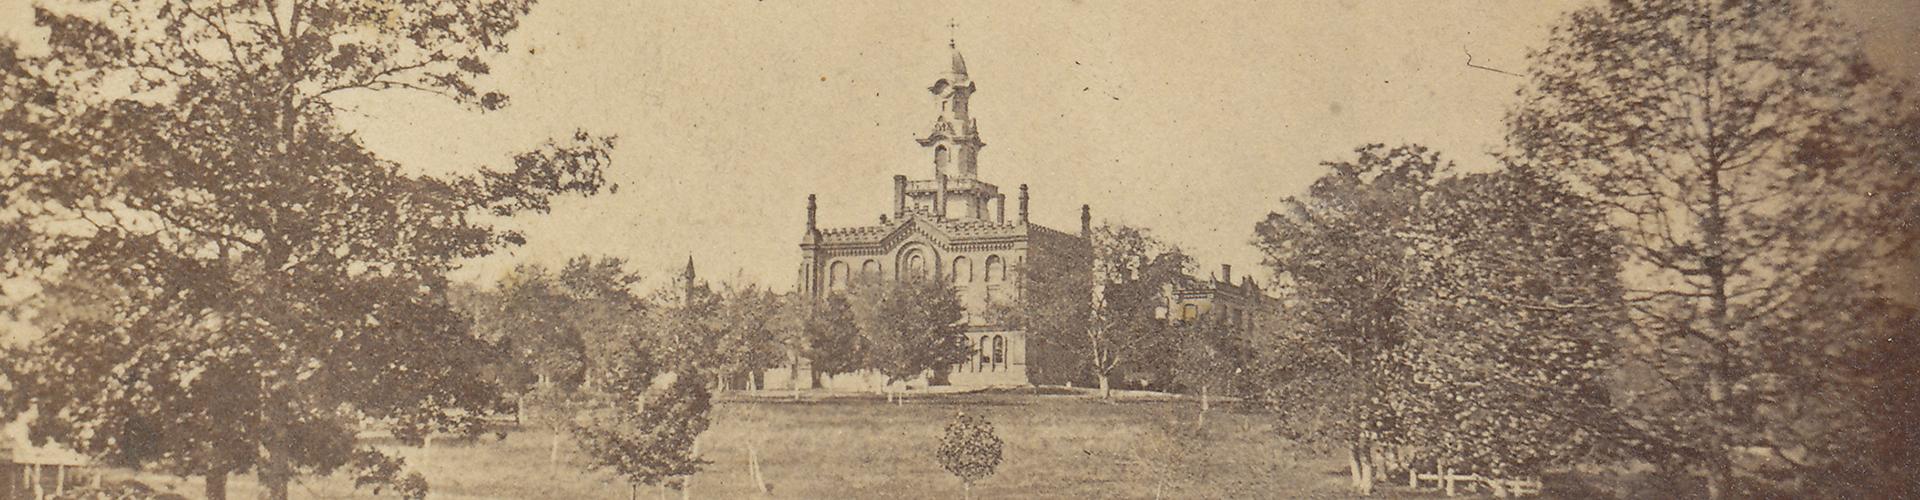 Old campus photo